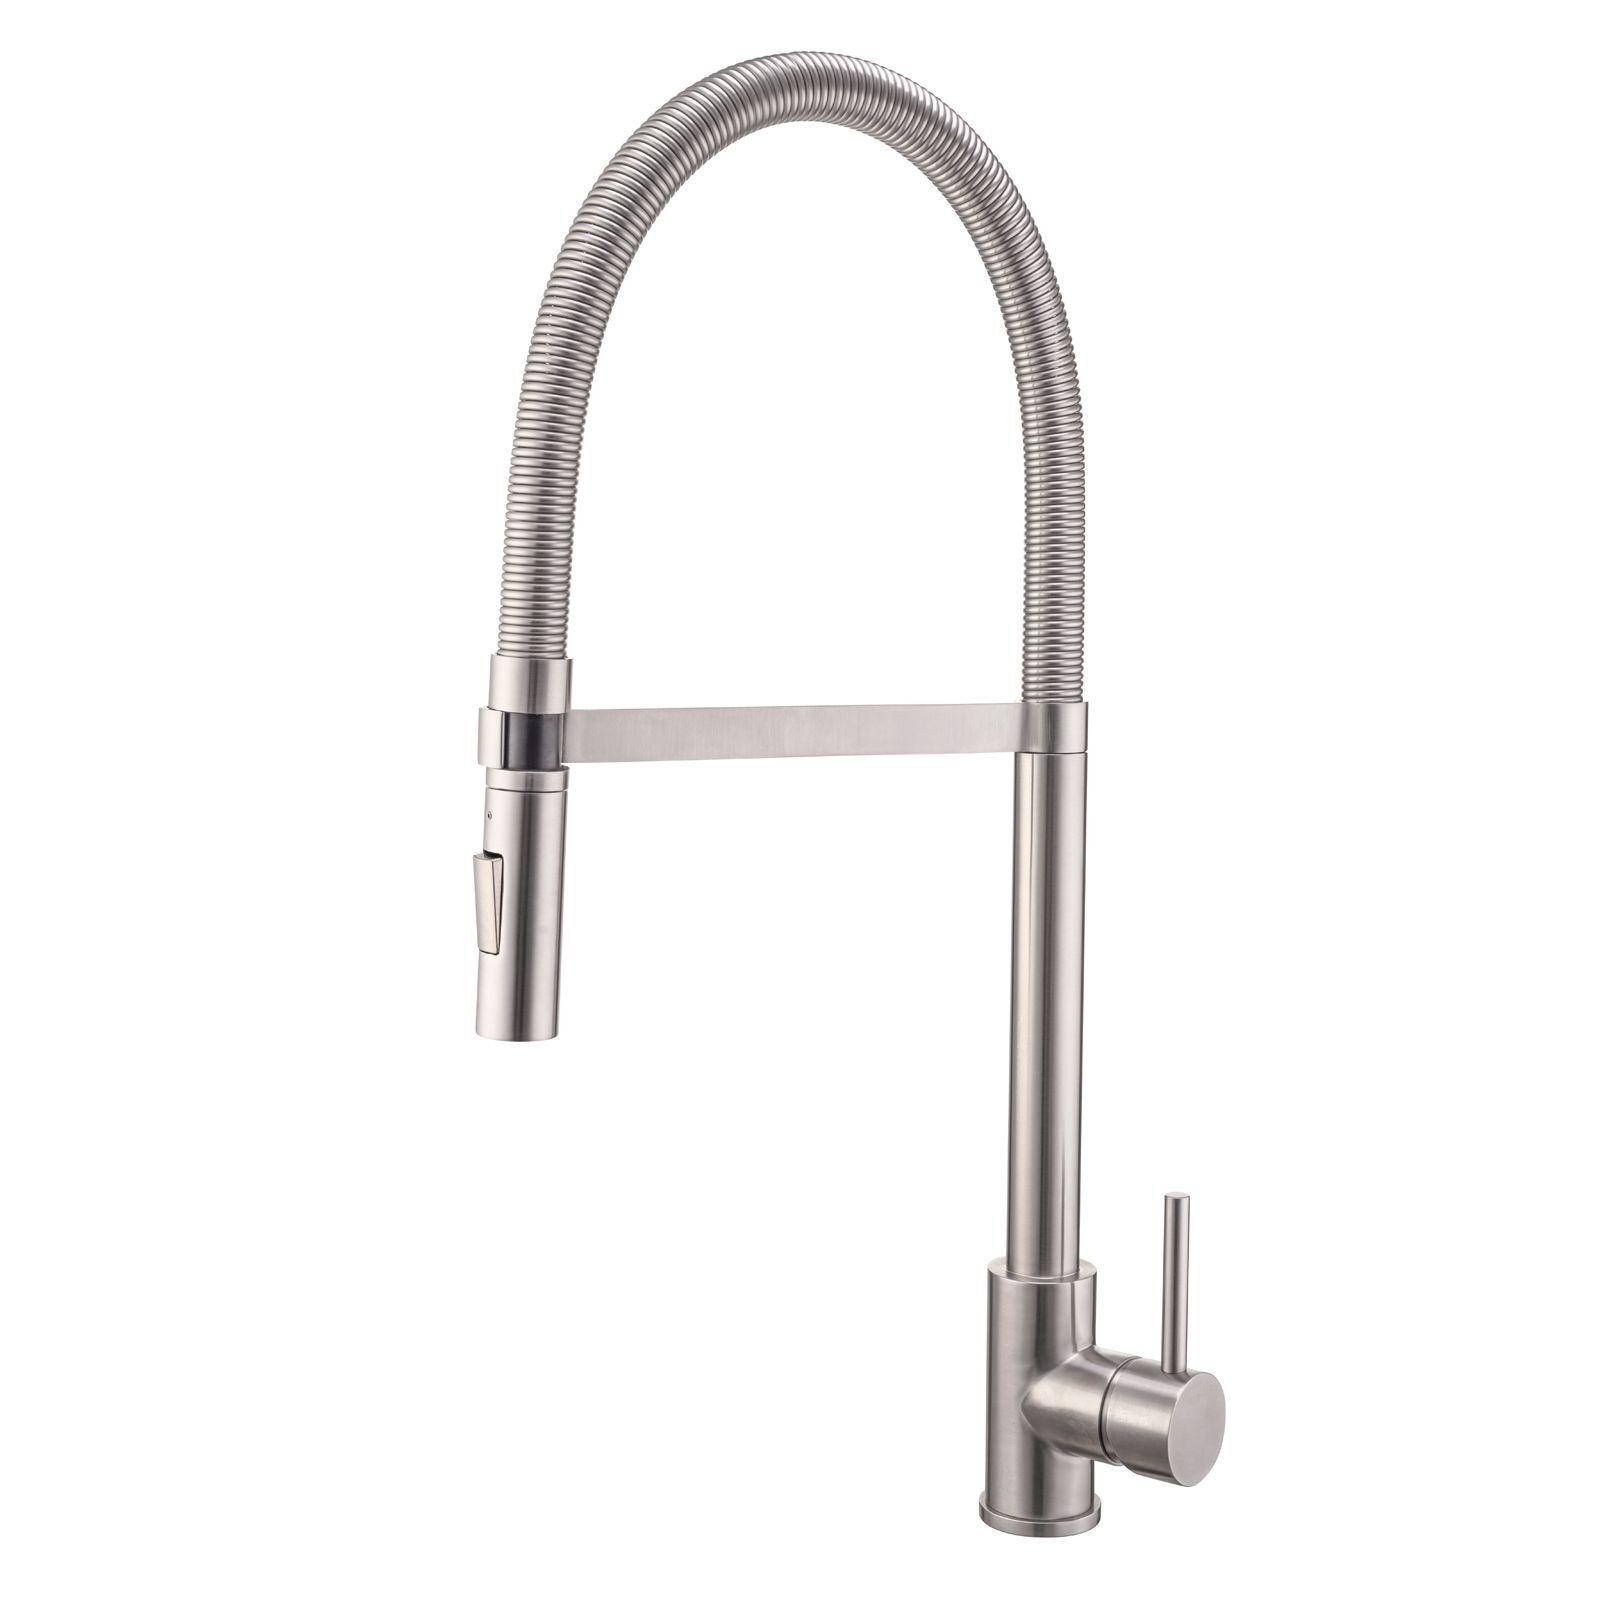 Mondella Resonance Stainless Steel Vege Spray Side Lever Sink Mixer - Suitable Mains Pressure Only